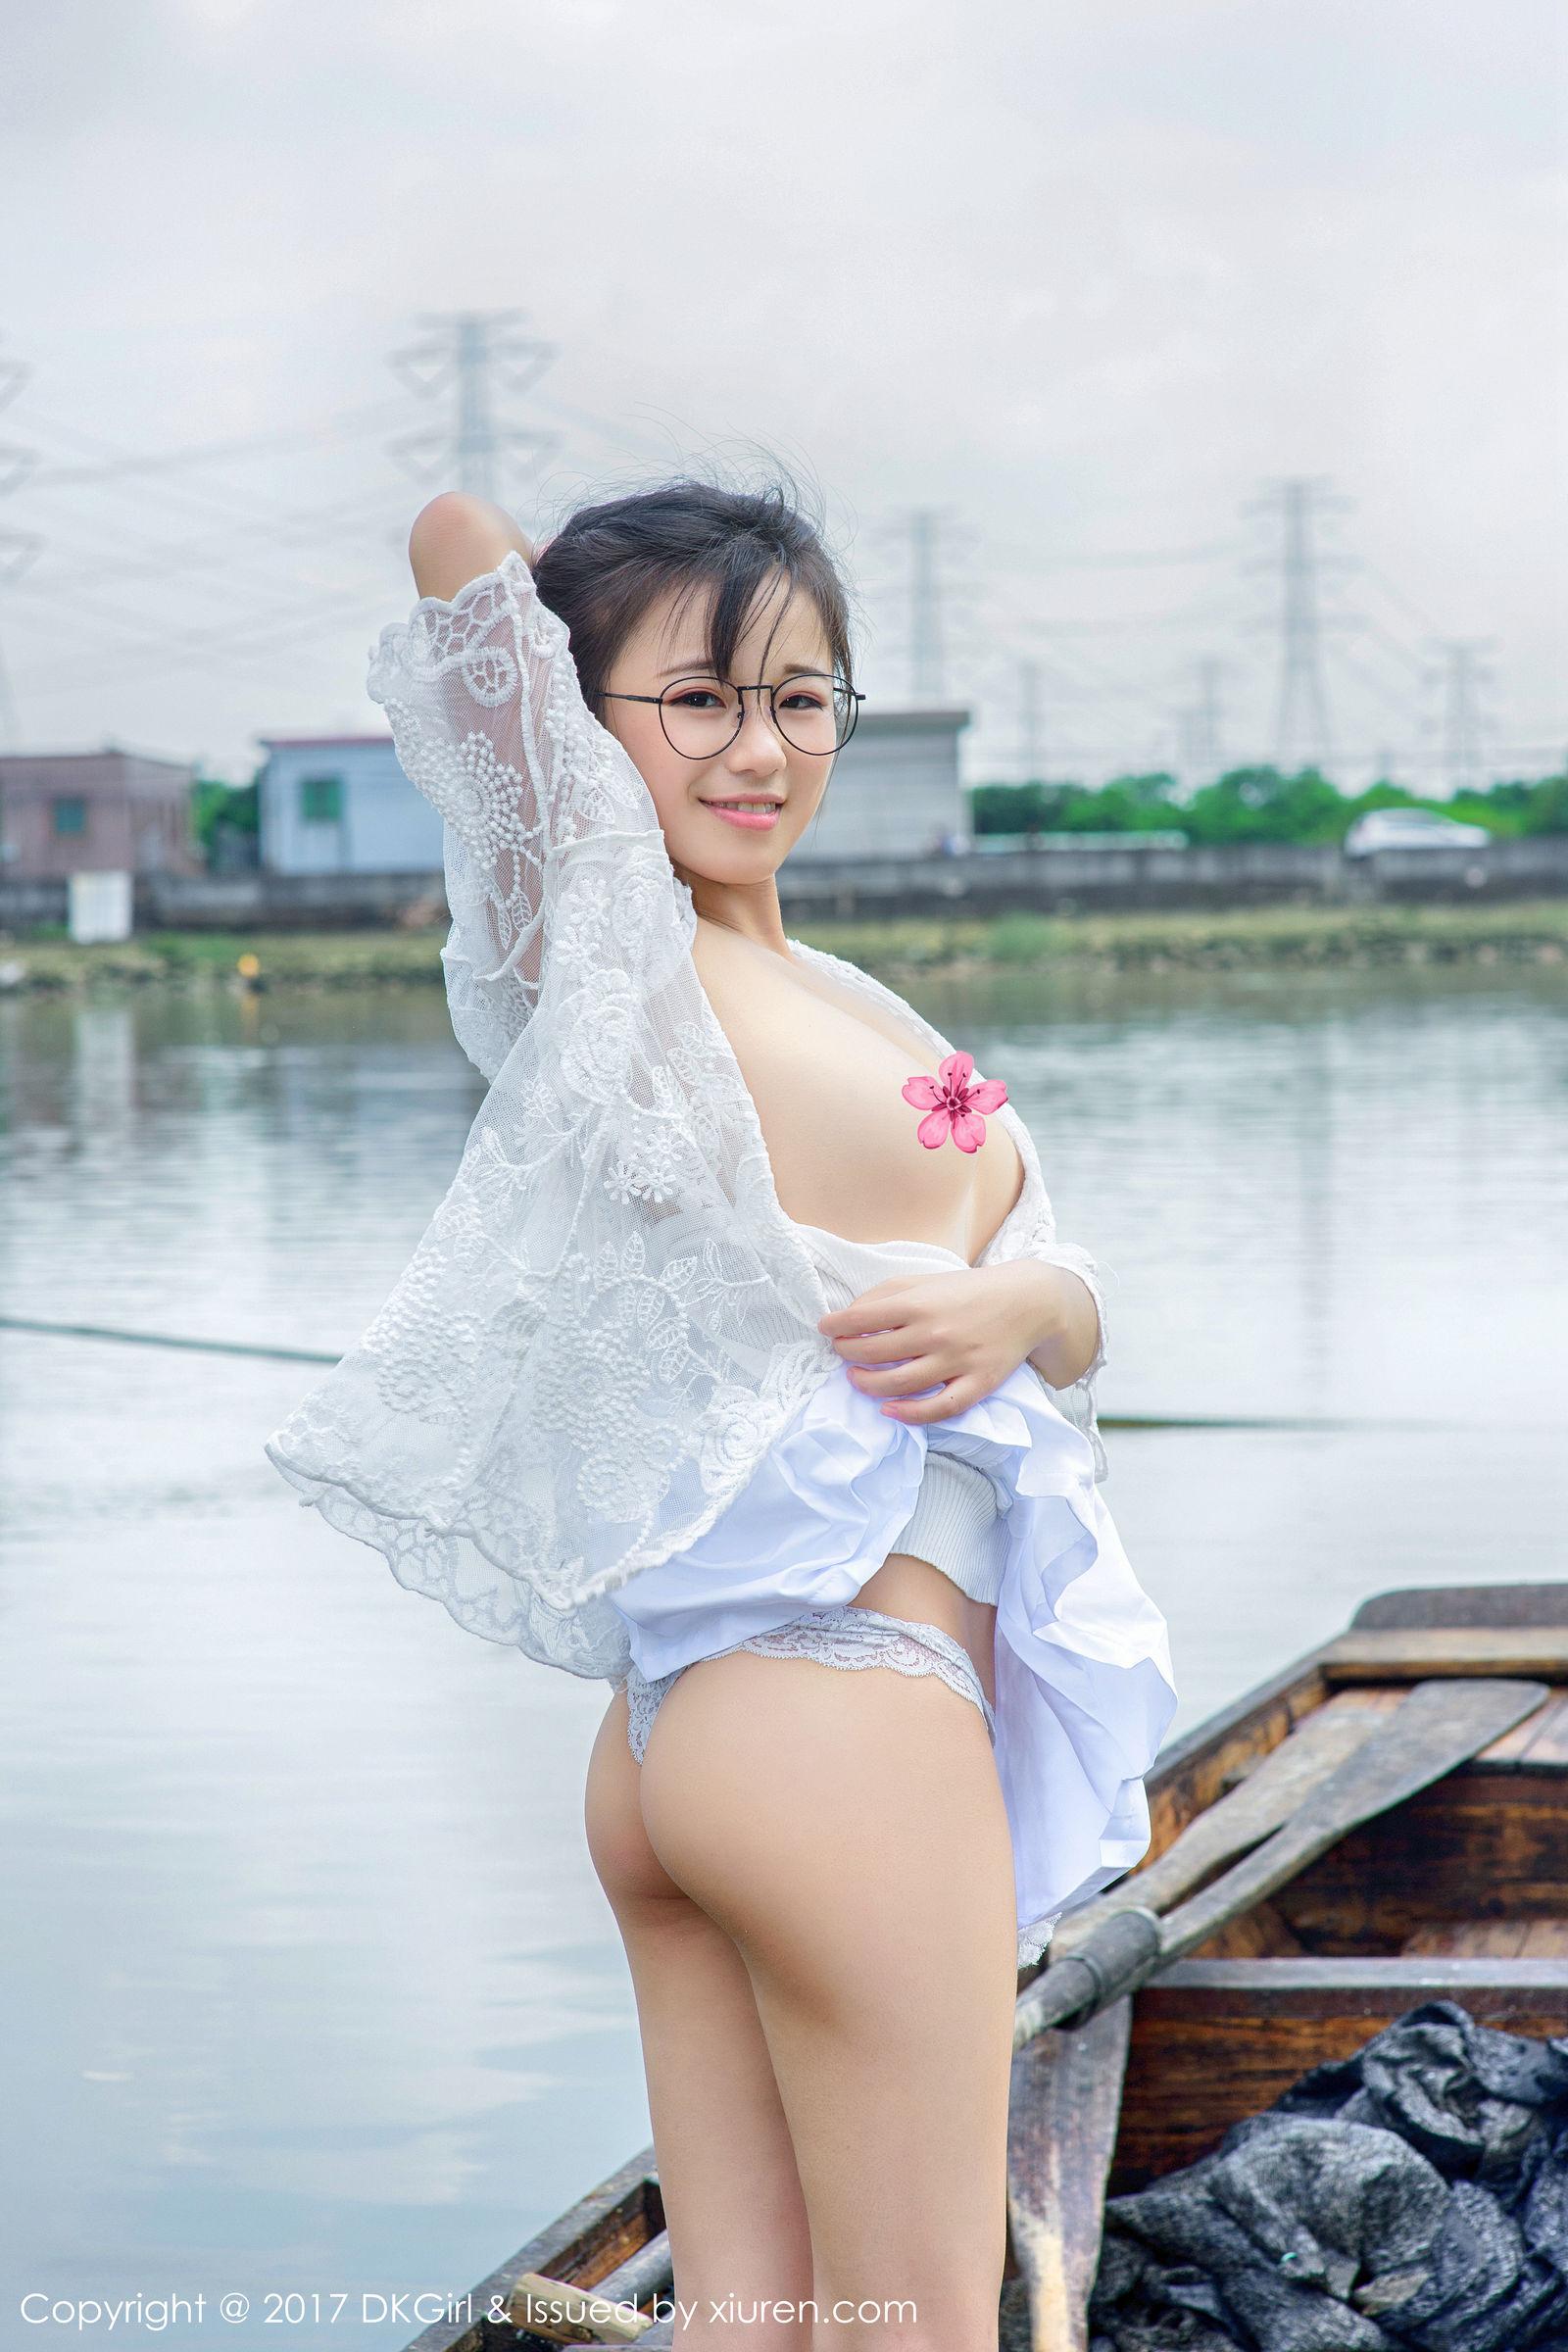 [DKGirl御女郎] VOL.051 仓井优香 - 低涌之夏主题写真[56P]